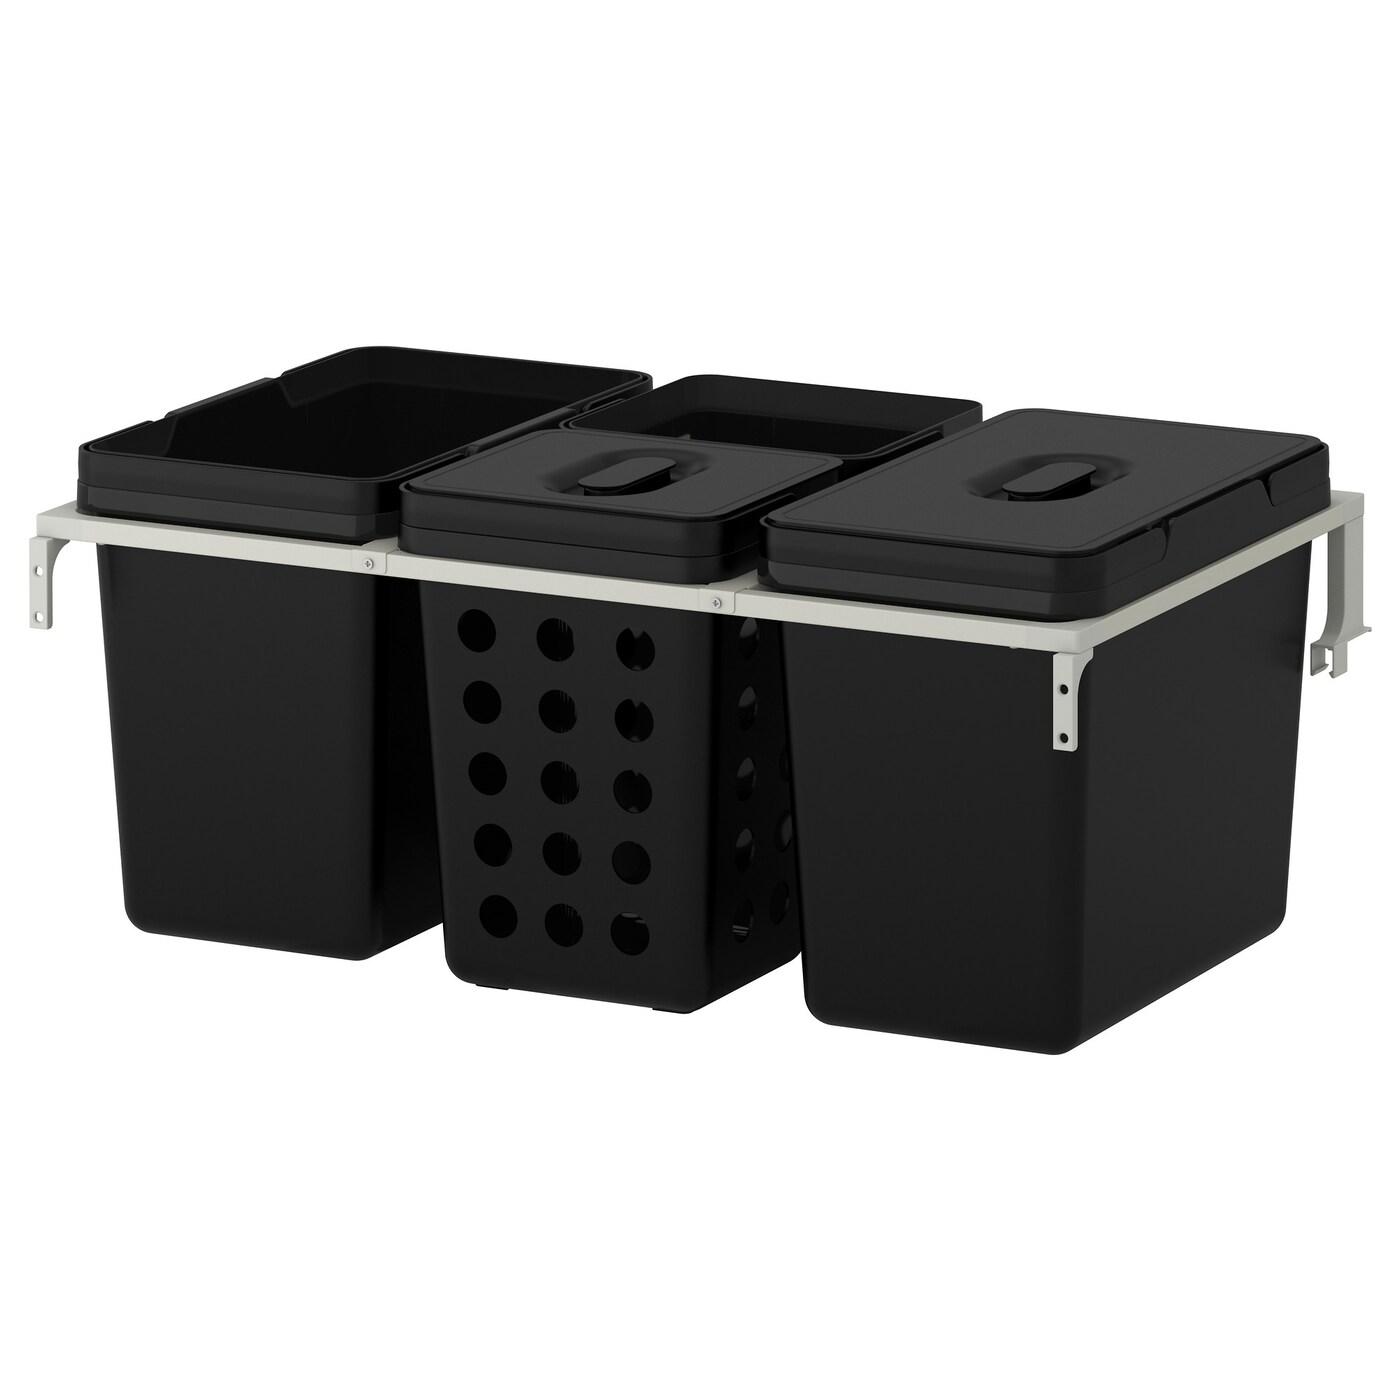 Afvalbak keukenkast keukenkast inrichting ikea for Ikea differenziata